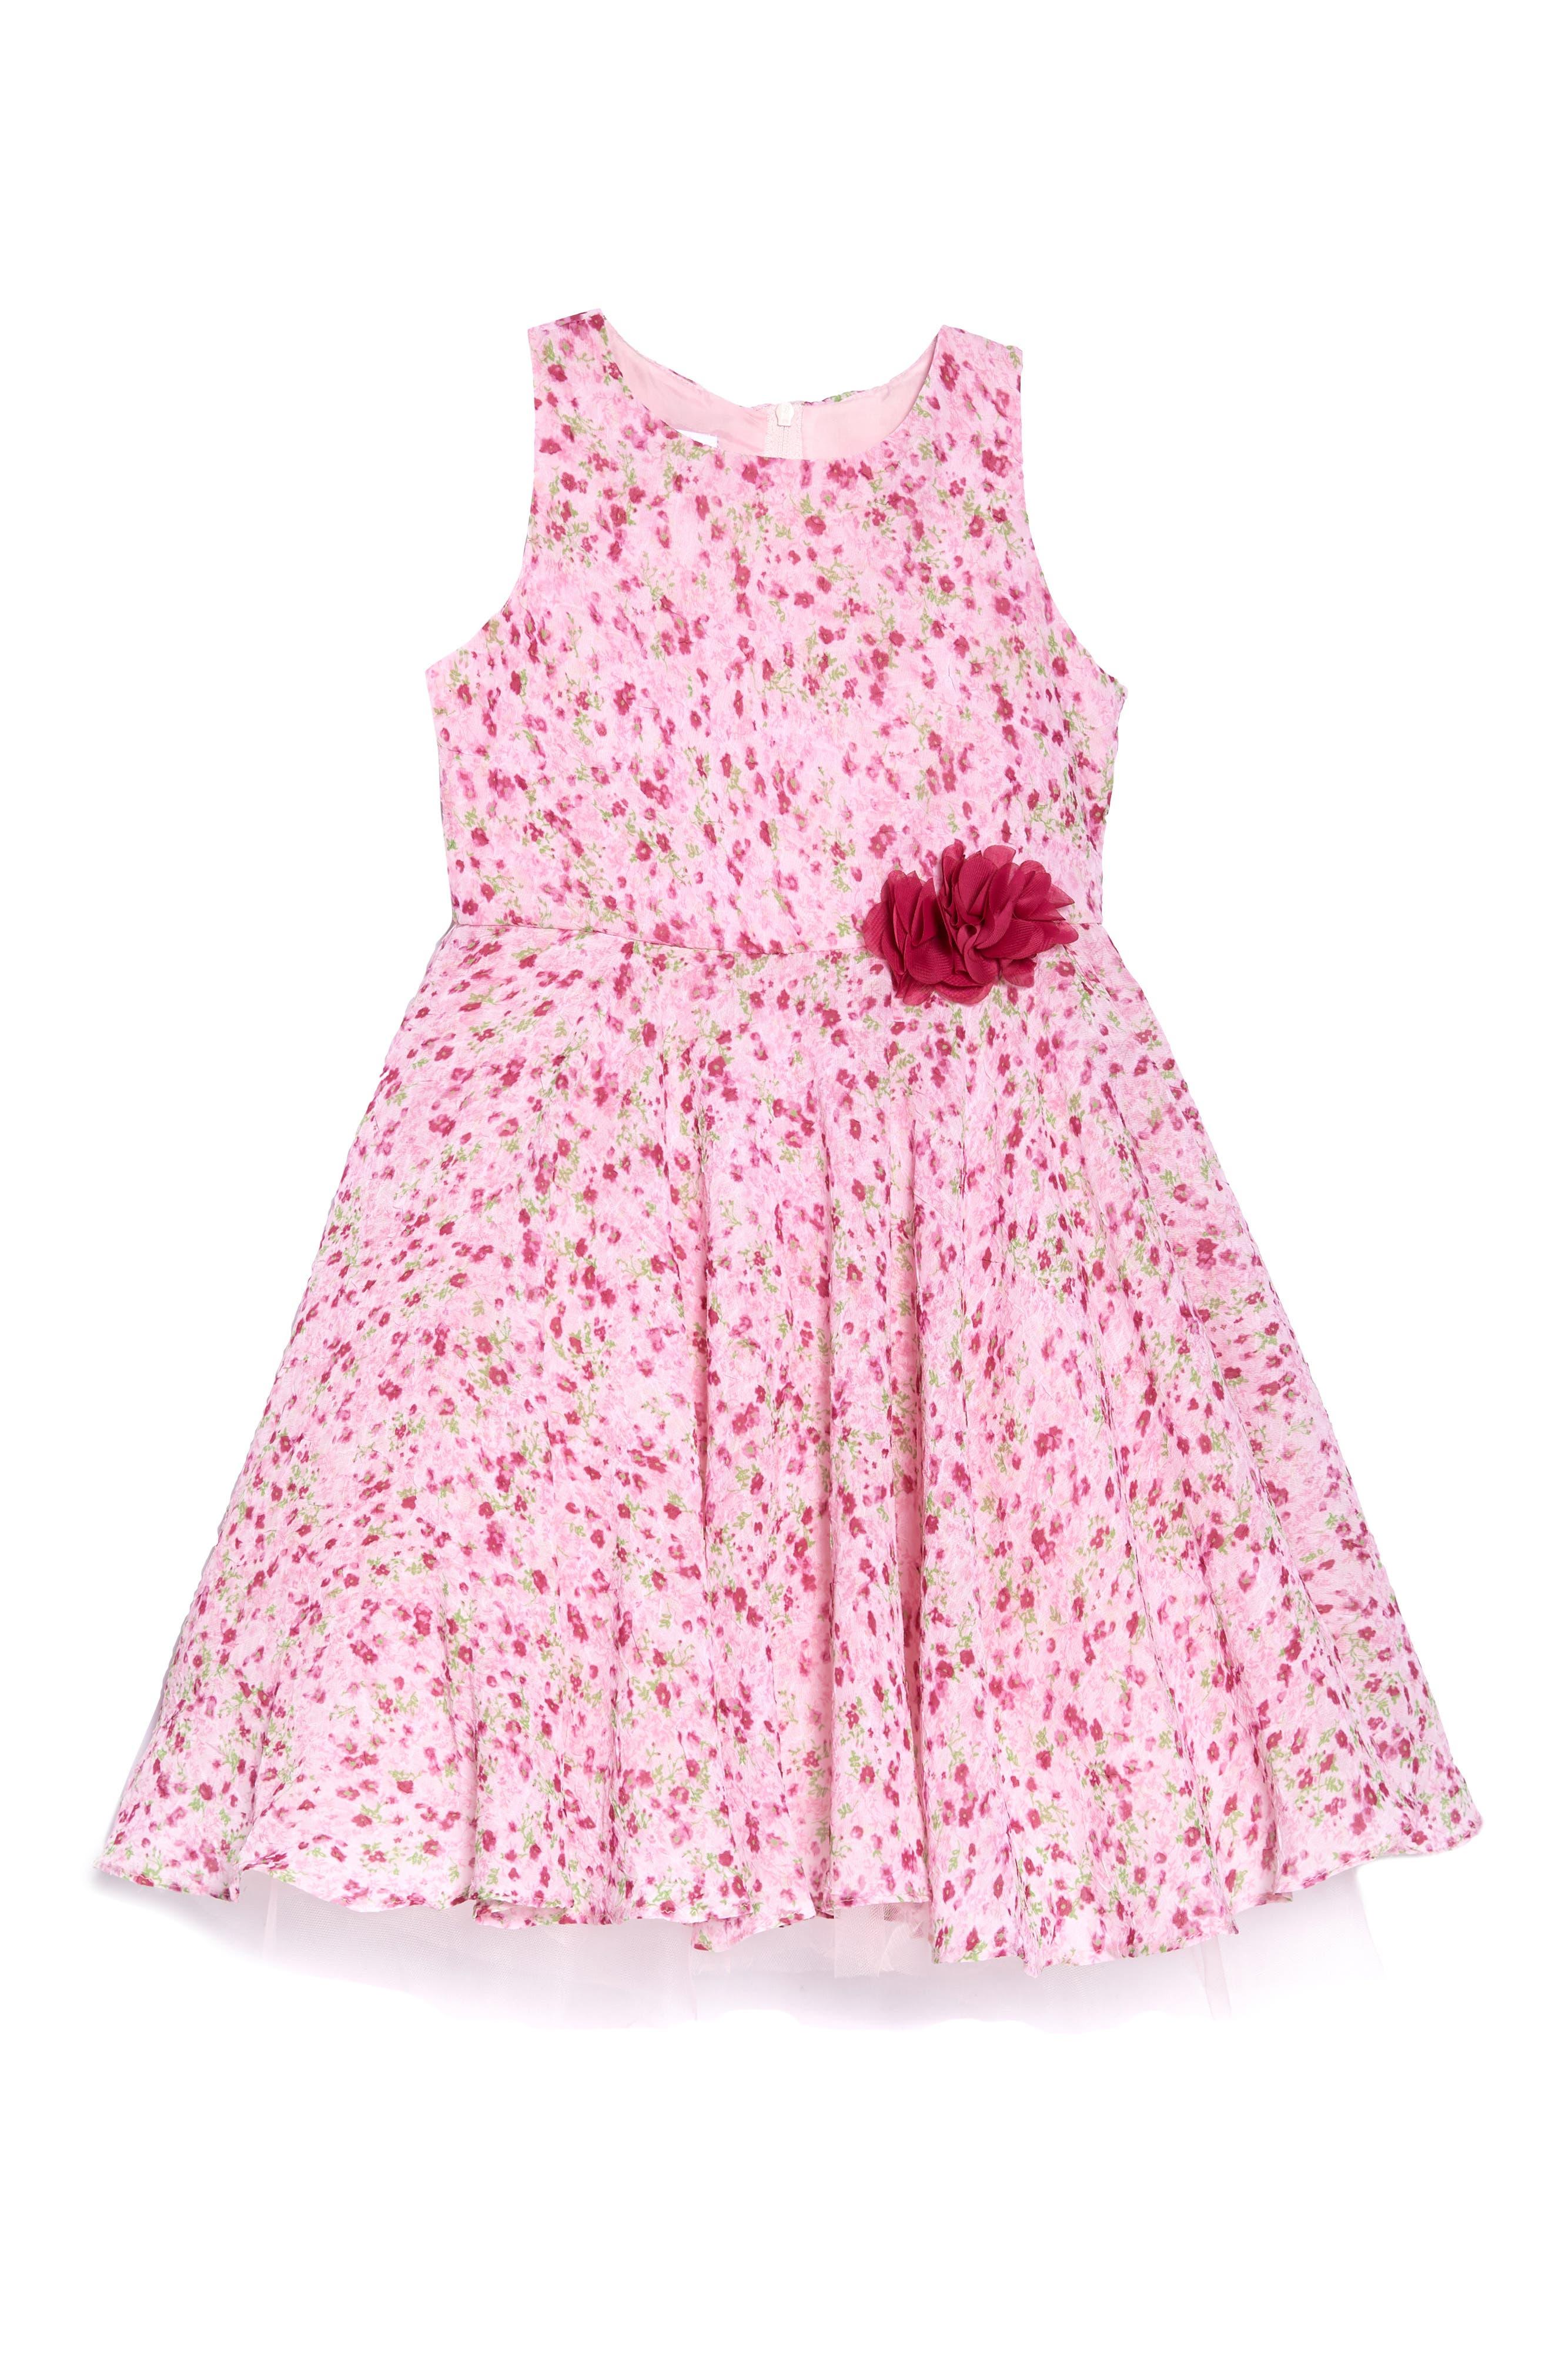 Floral Print Chiffon Dress,                         Main,                         color, Pink